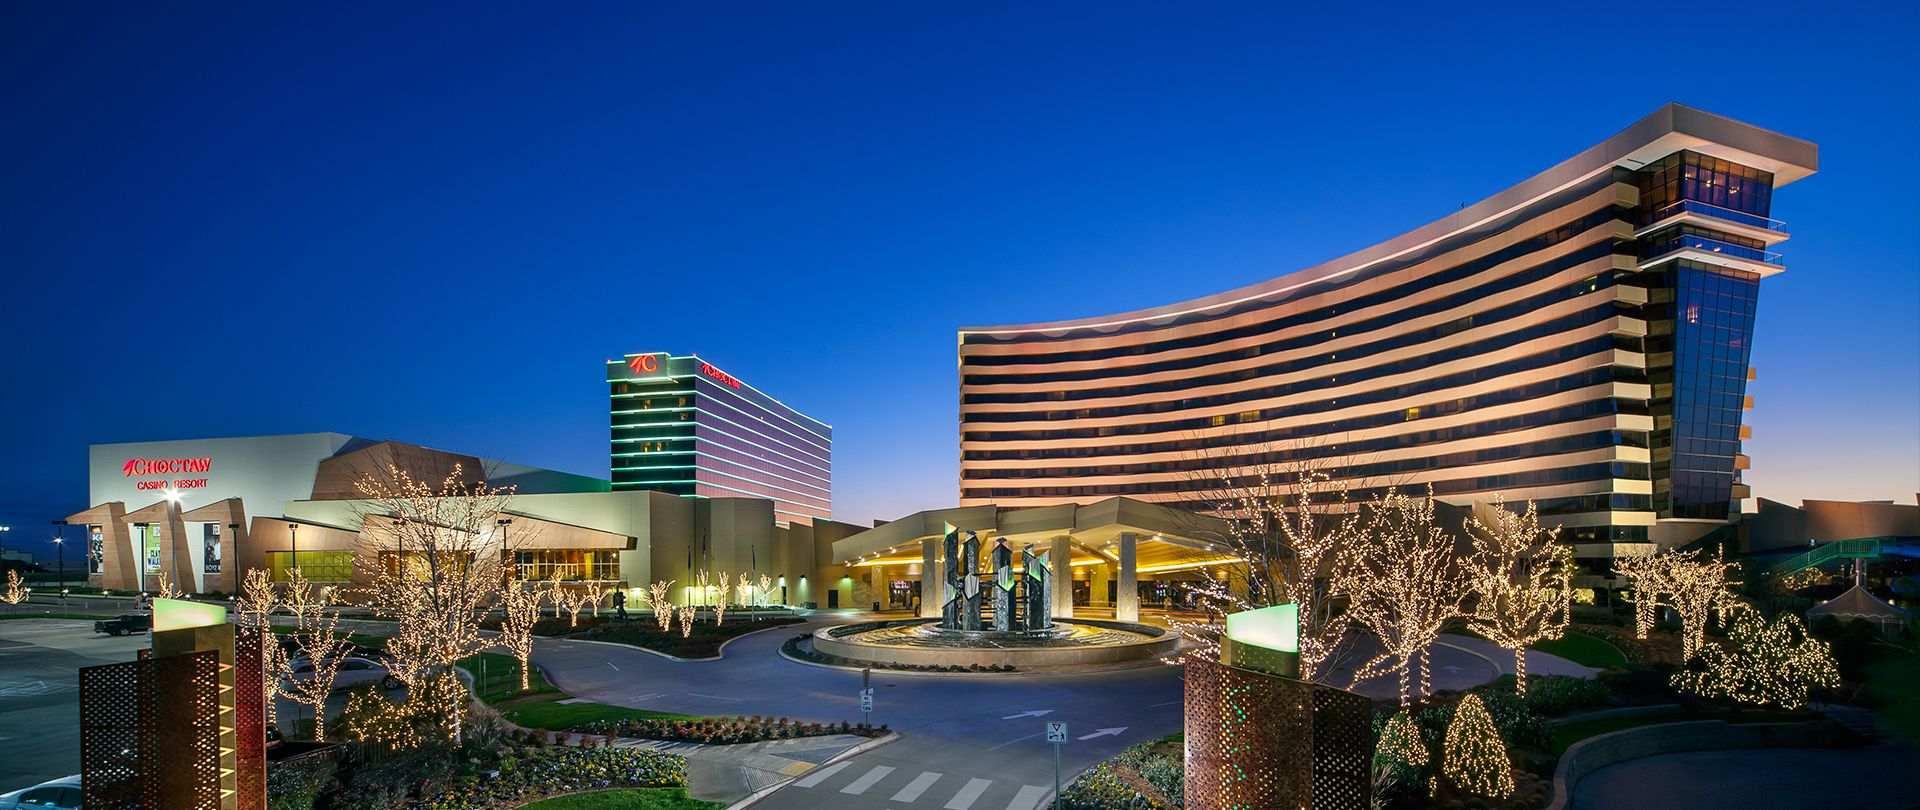 Windstar casino oklahoma